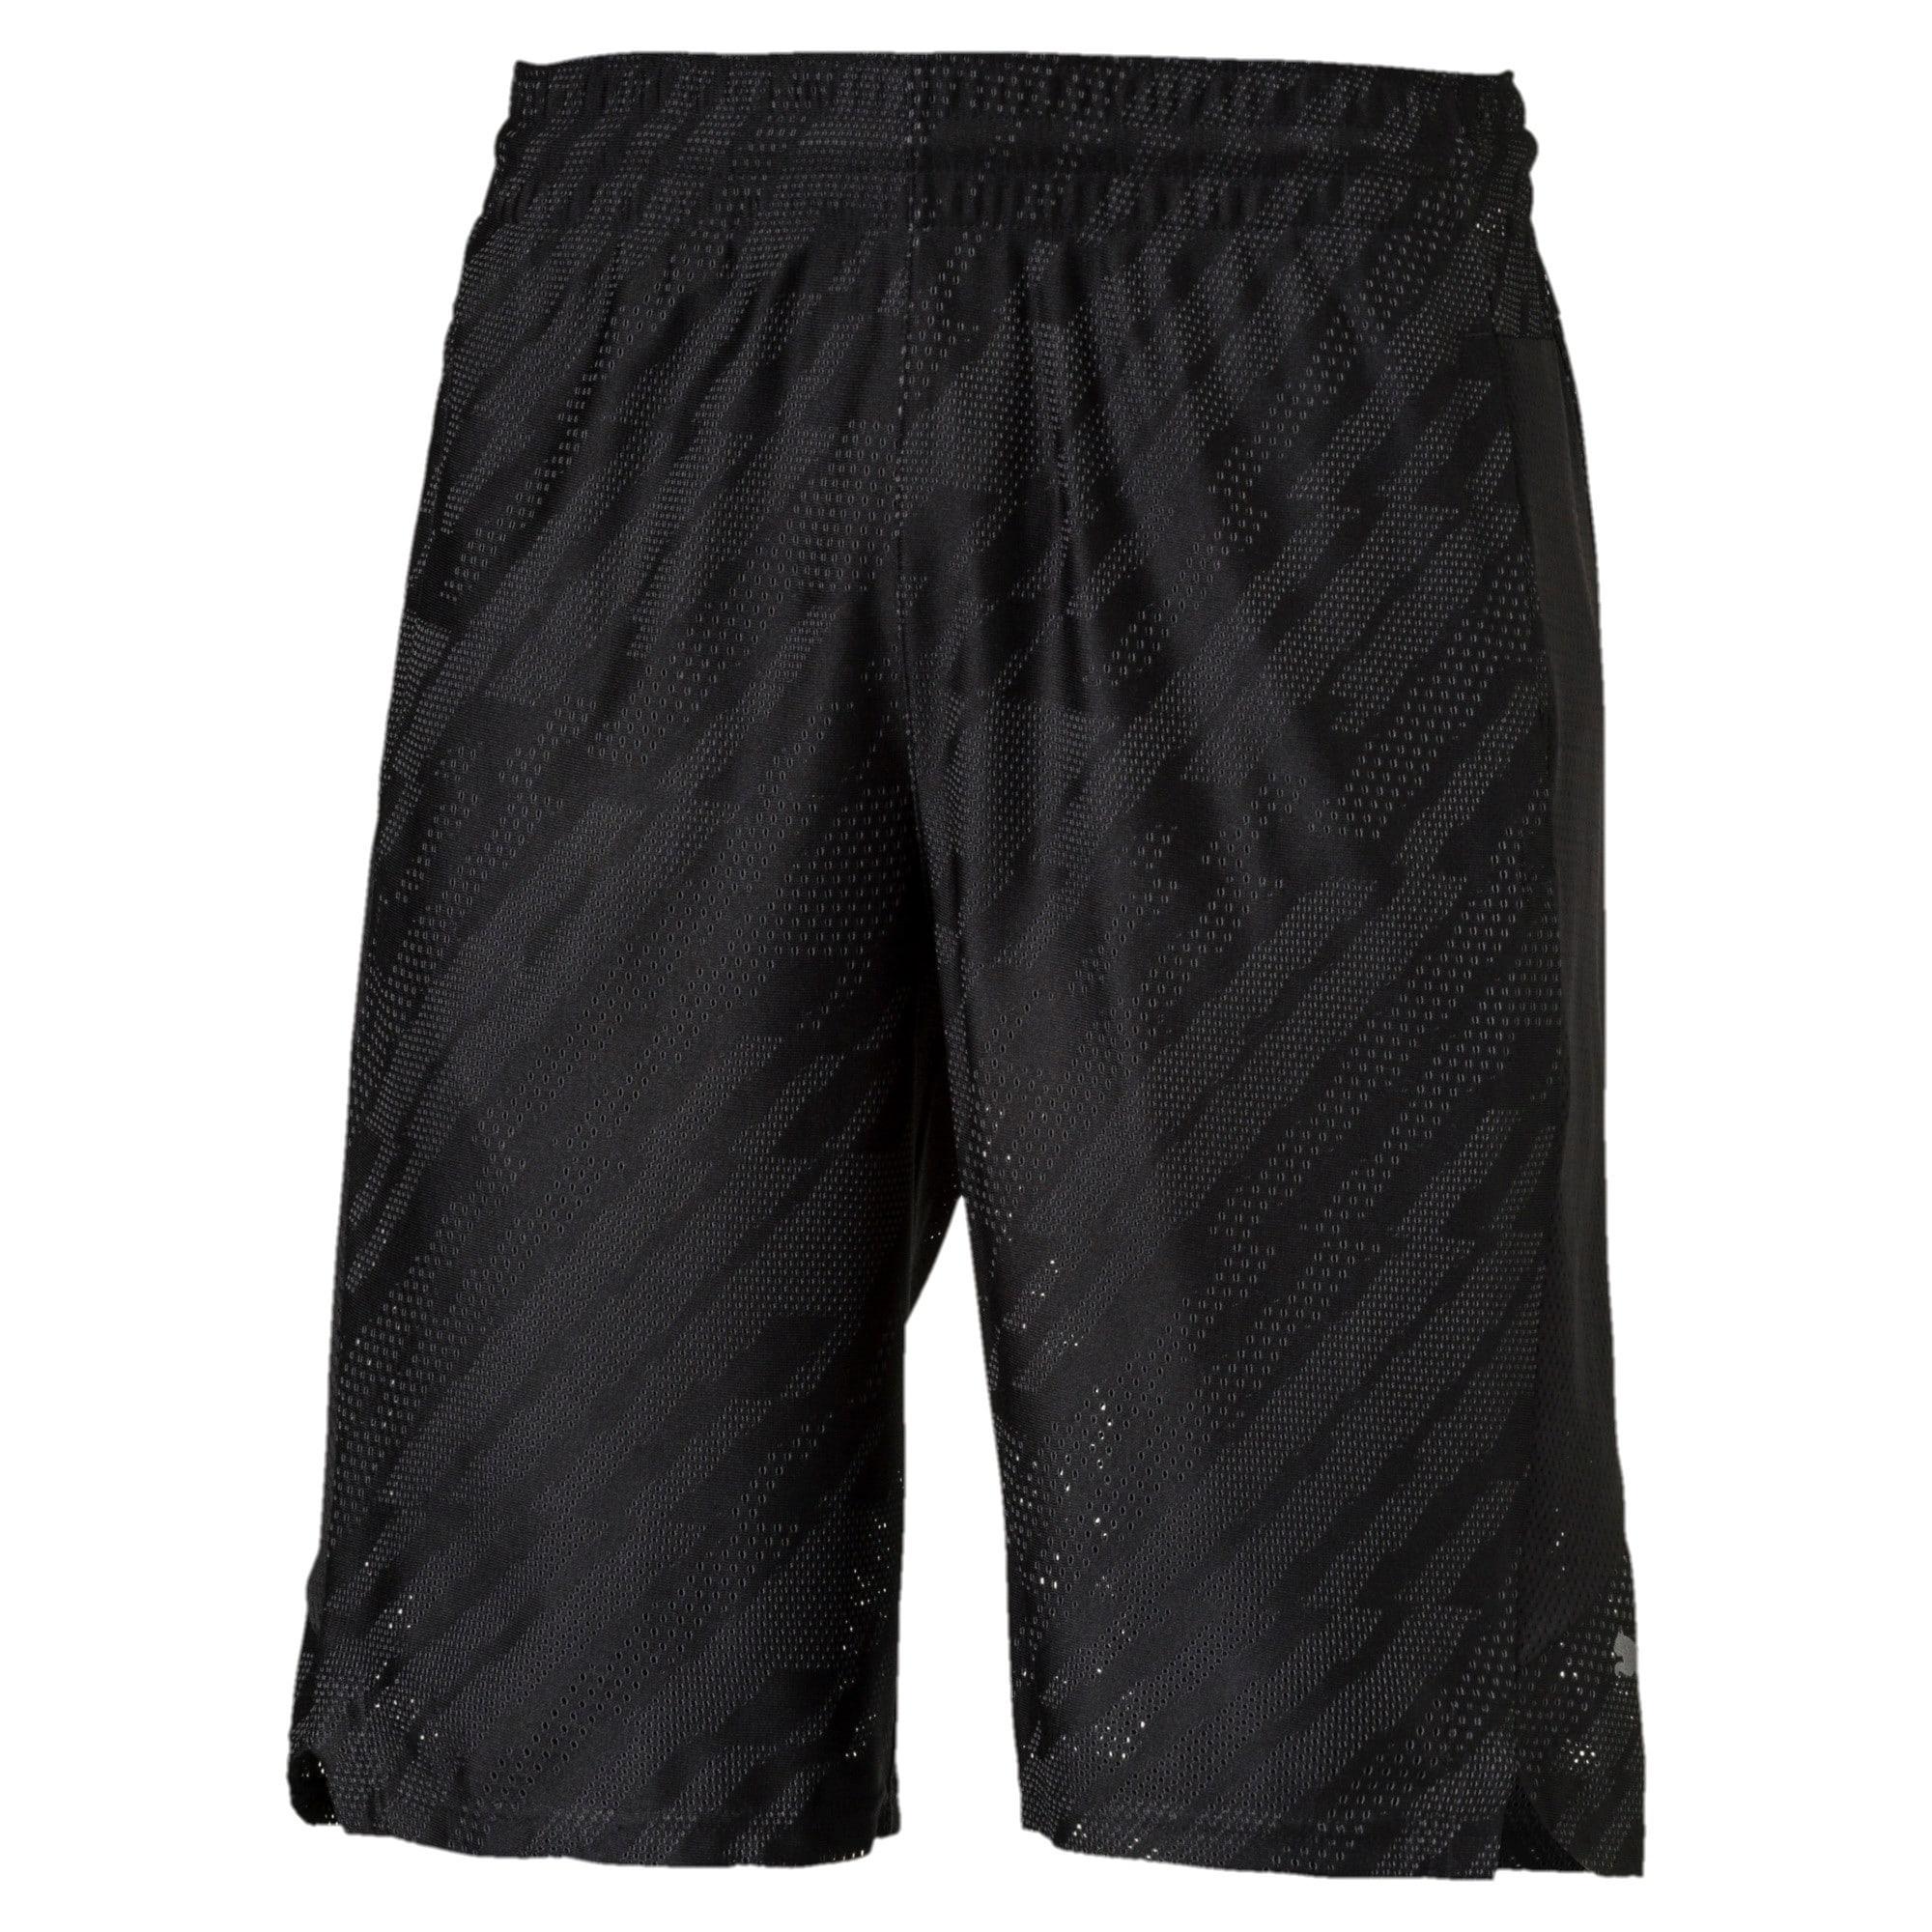 "Thumbnail 4 of VENT 10"" Men's Knit Shorts, Puma Black-Iron Gate, medium-IND"